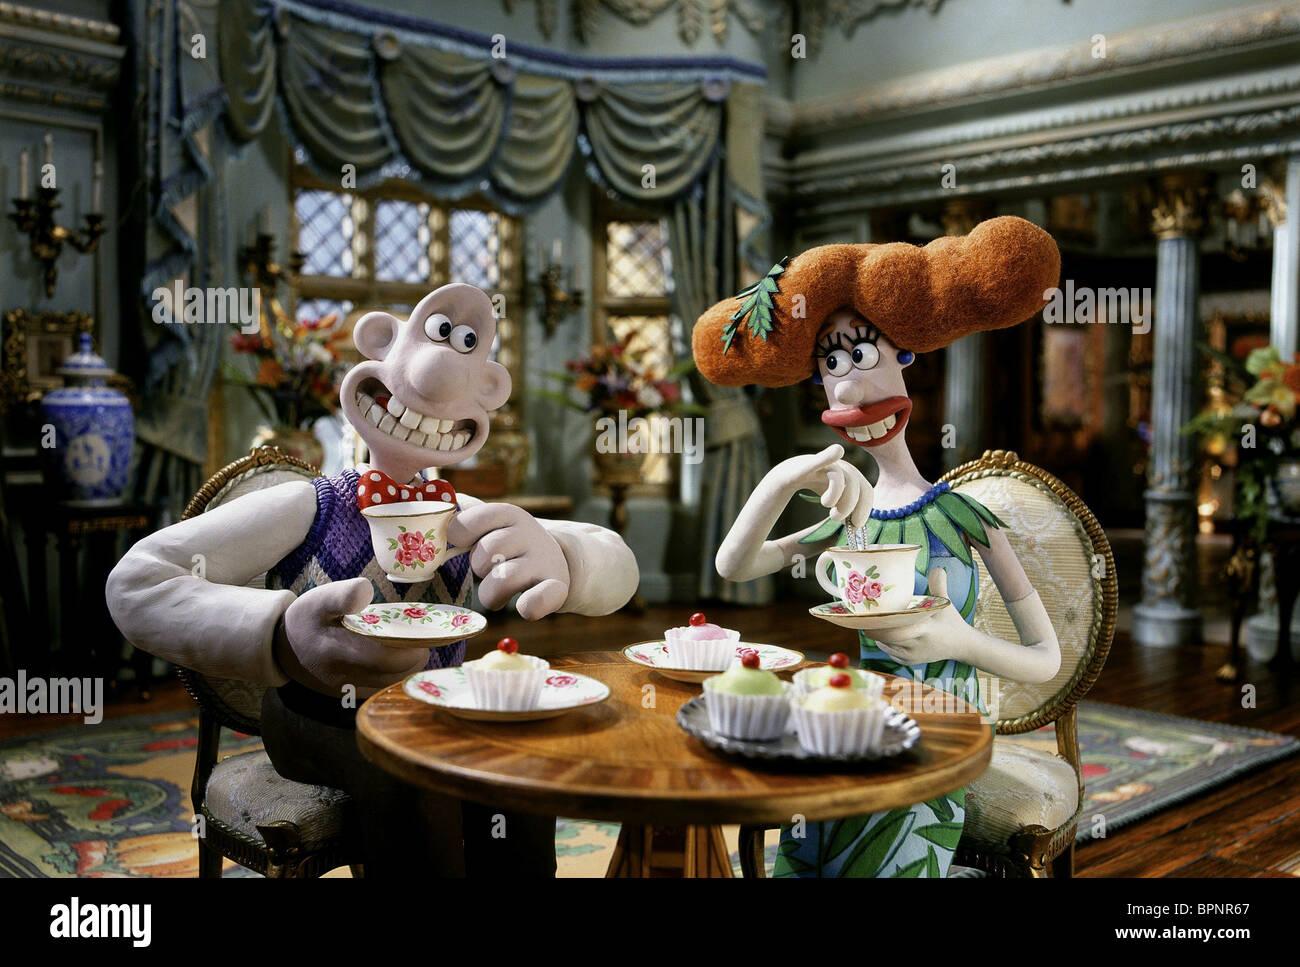 Wallace Lady Tottington The Curse Of The Were Rabbit 2005 Stock Photo Alamy